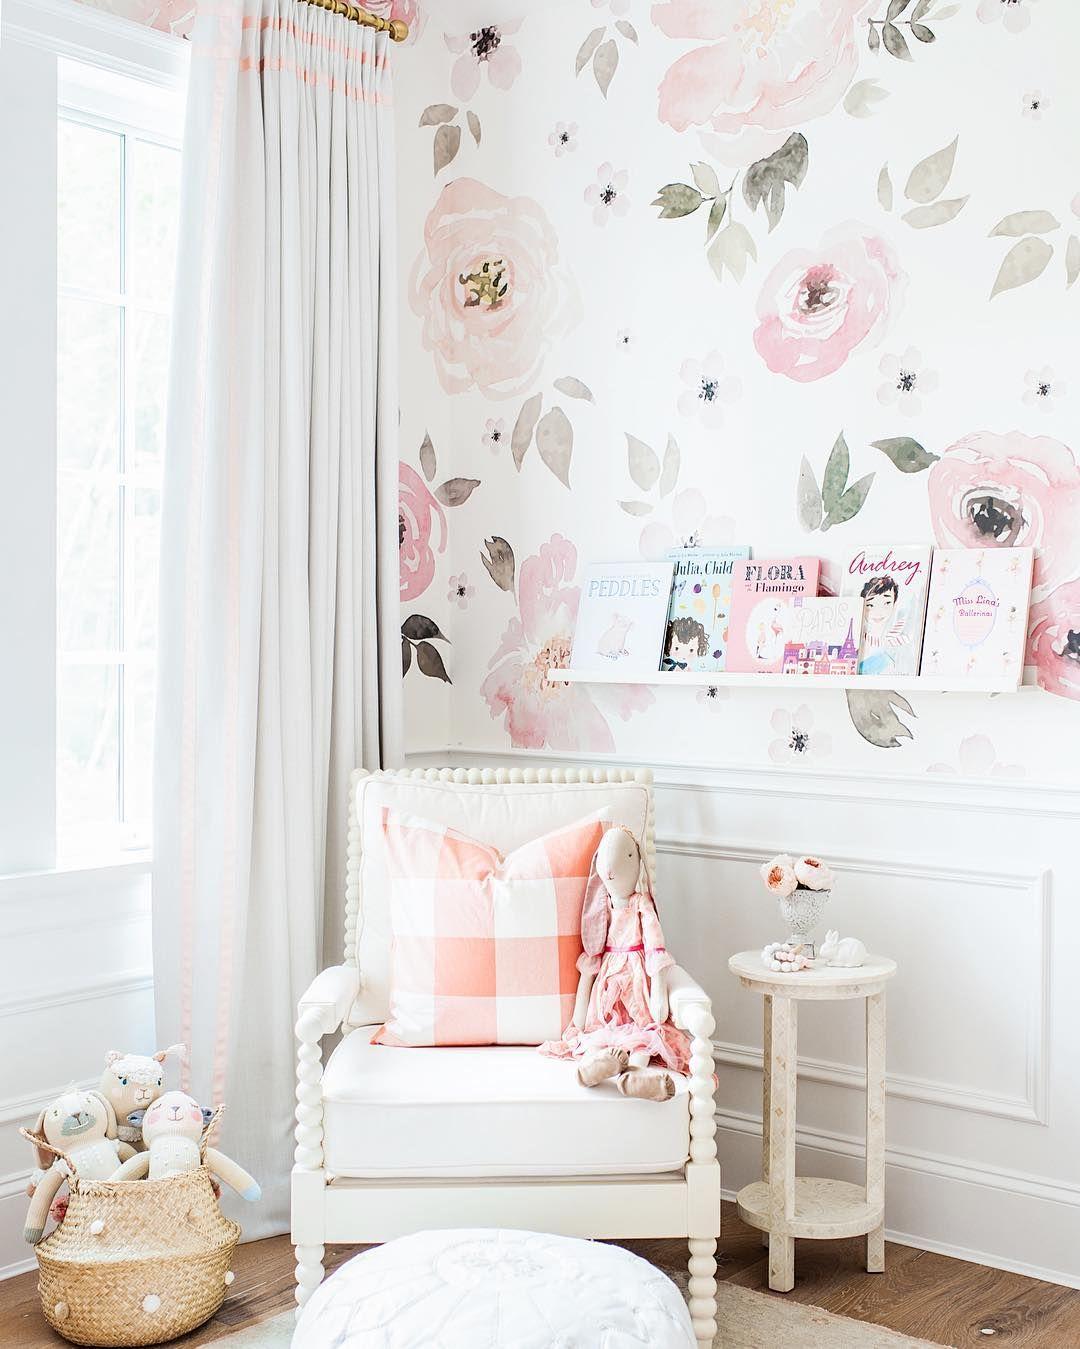 Pin de Jaime Marchese en Future Babies | Pinterest | Dormitorios ...